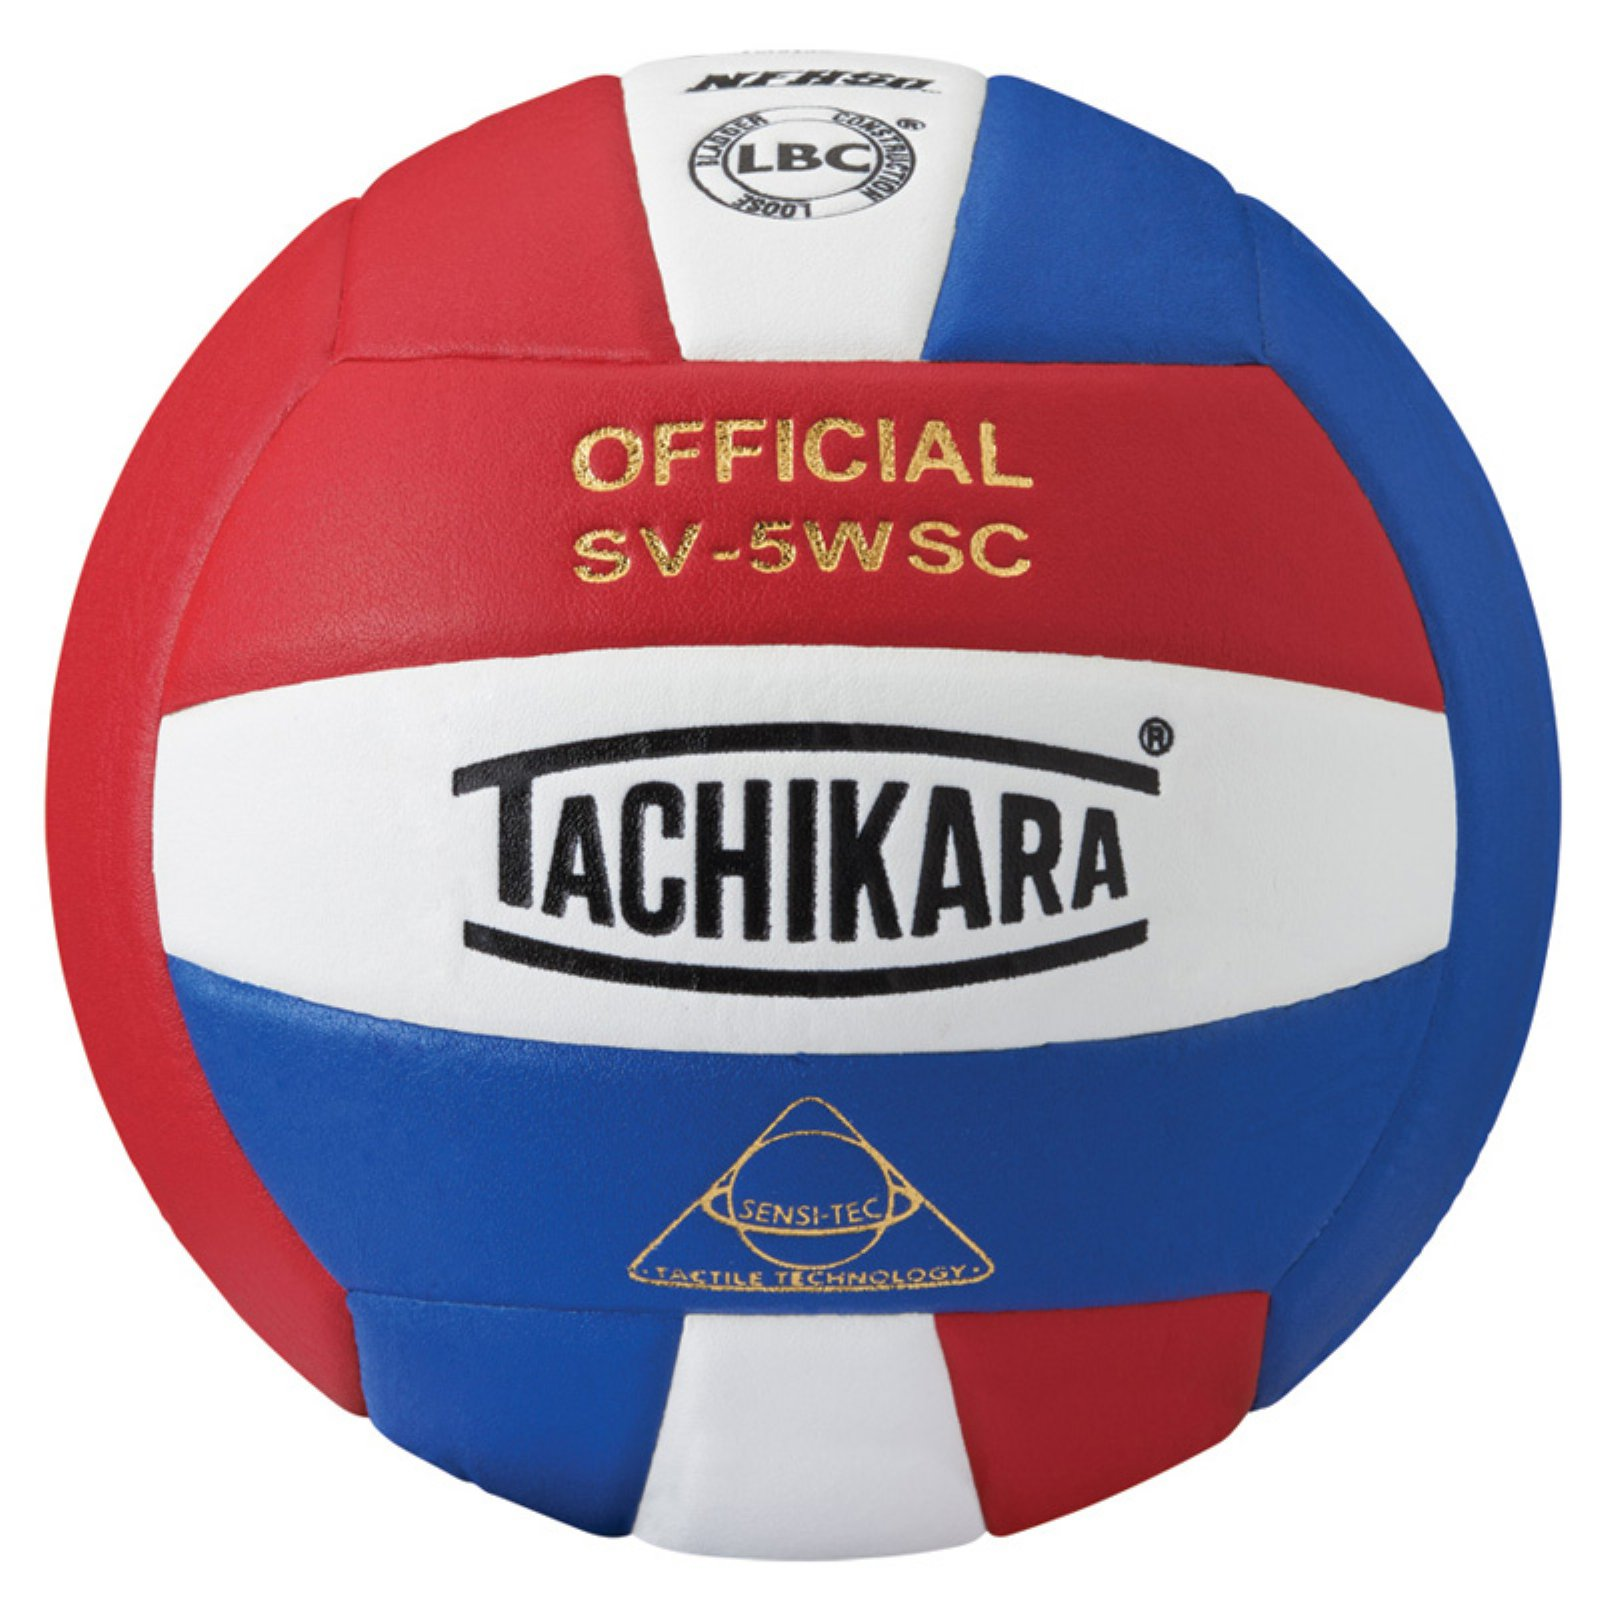 Tachikara SV5WSC Sensi-Tec Composite Volleyball